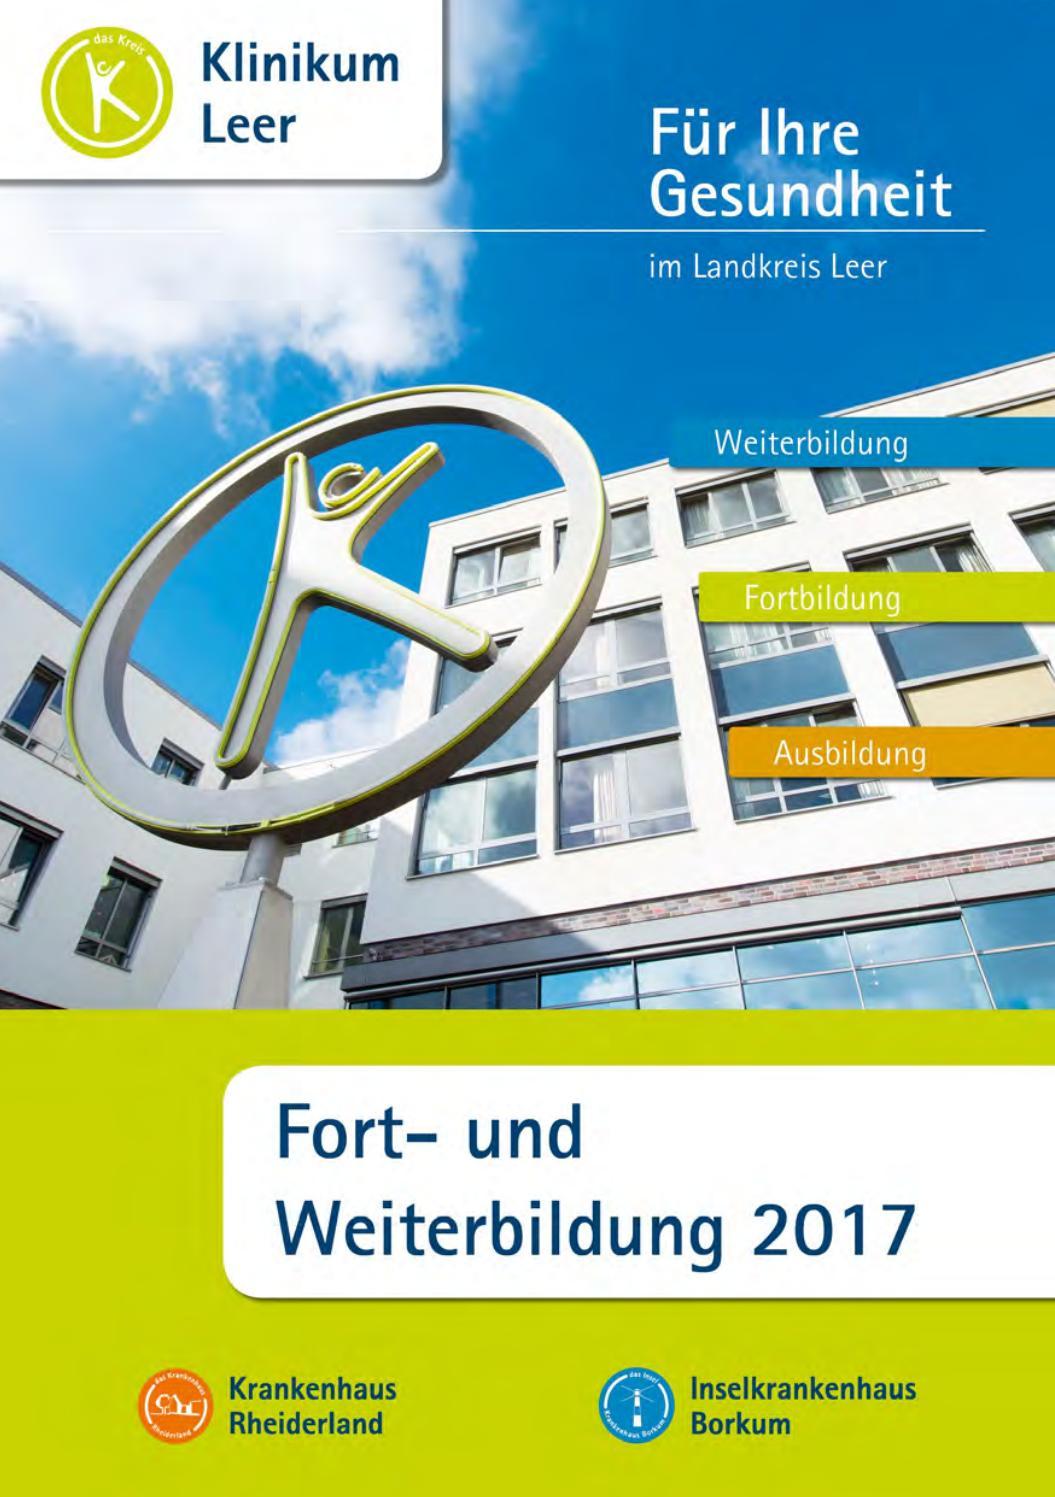 Programmheft Fortbildungen Klinikum Leer 2017 by klinikumleer - issuu